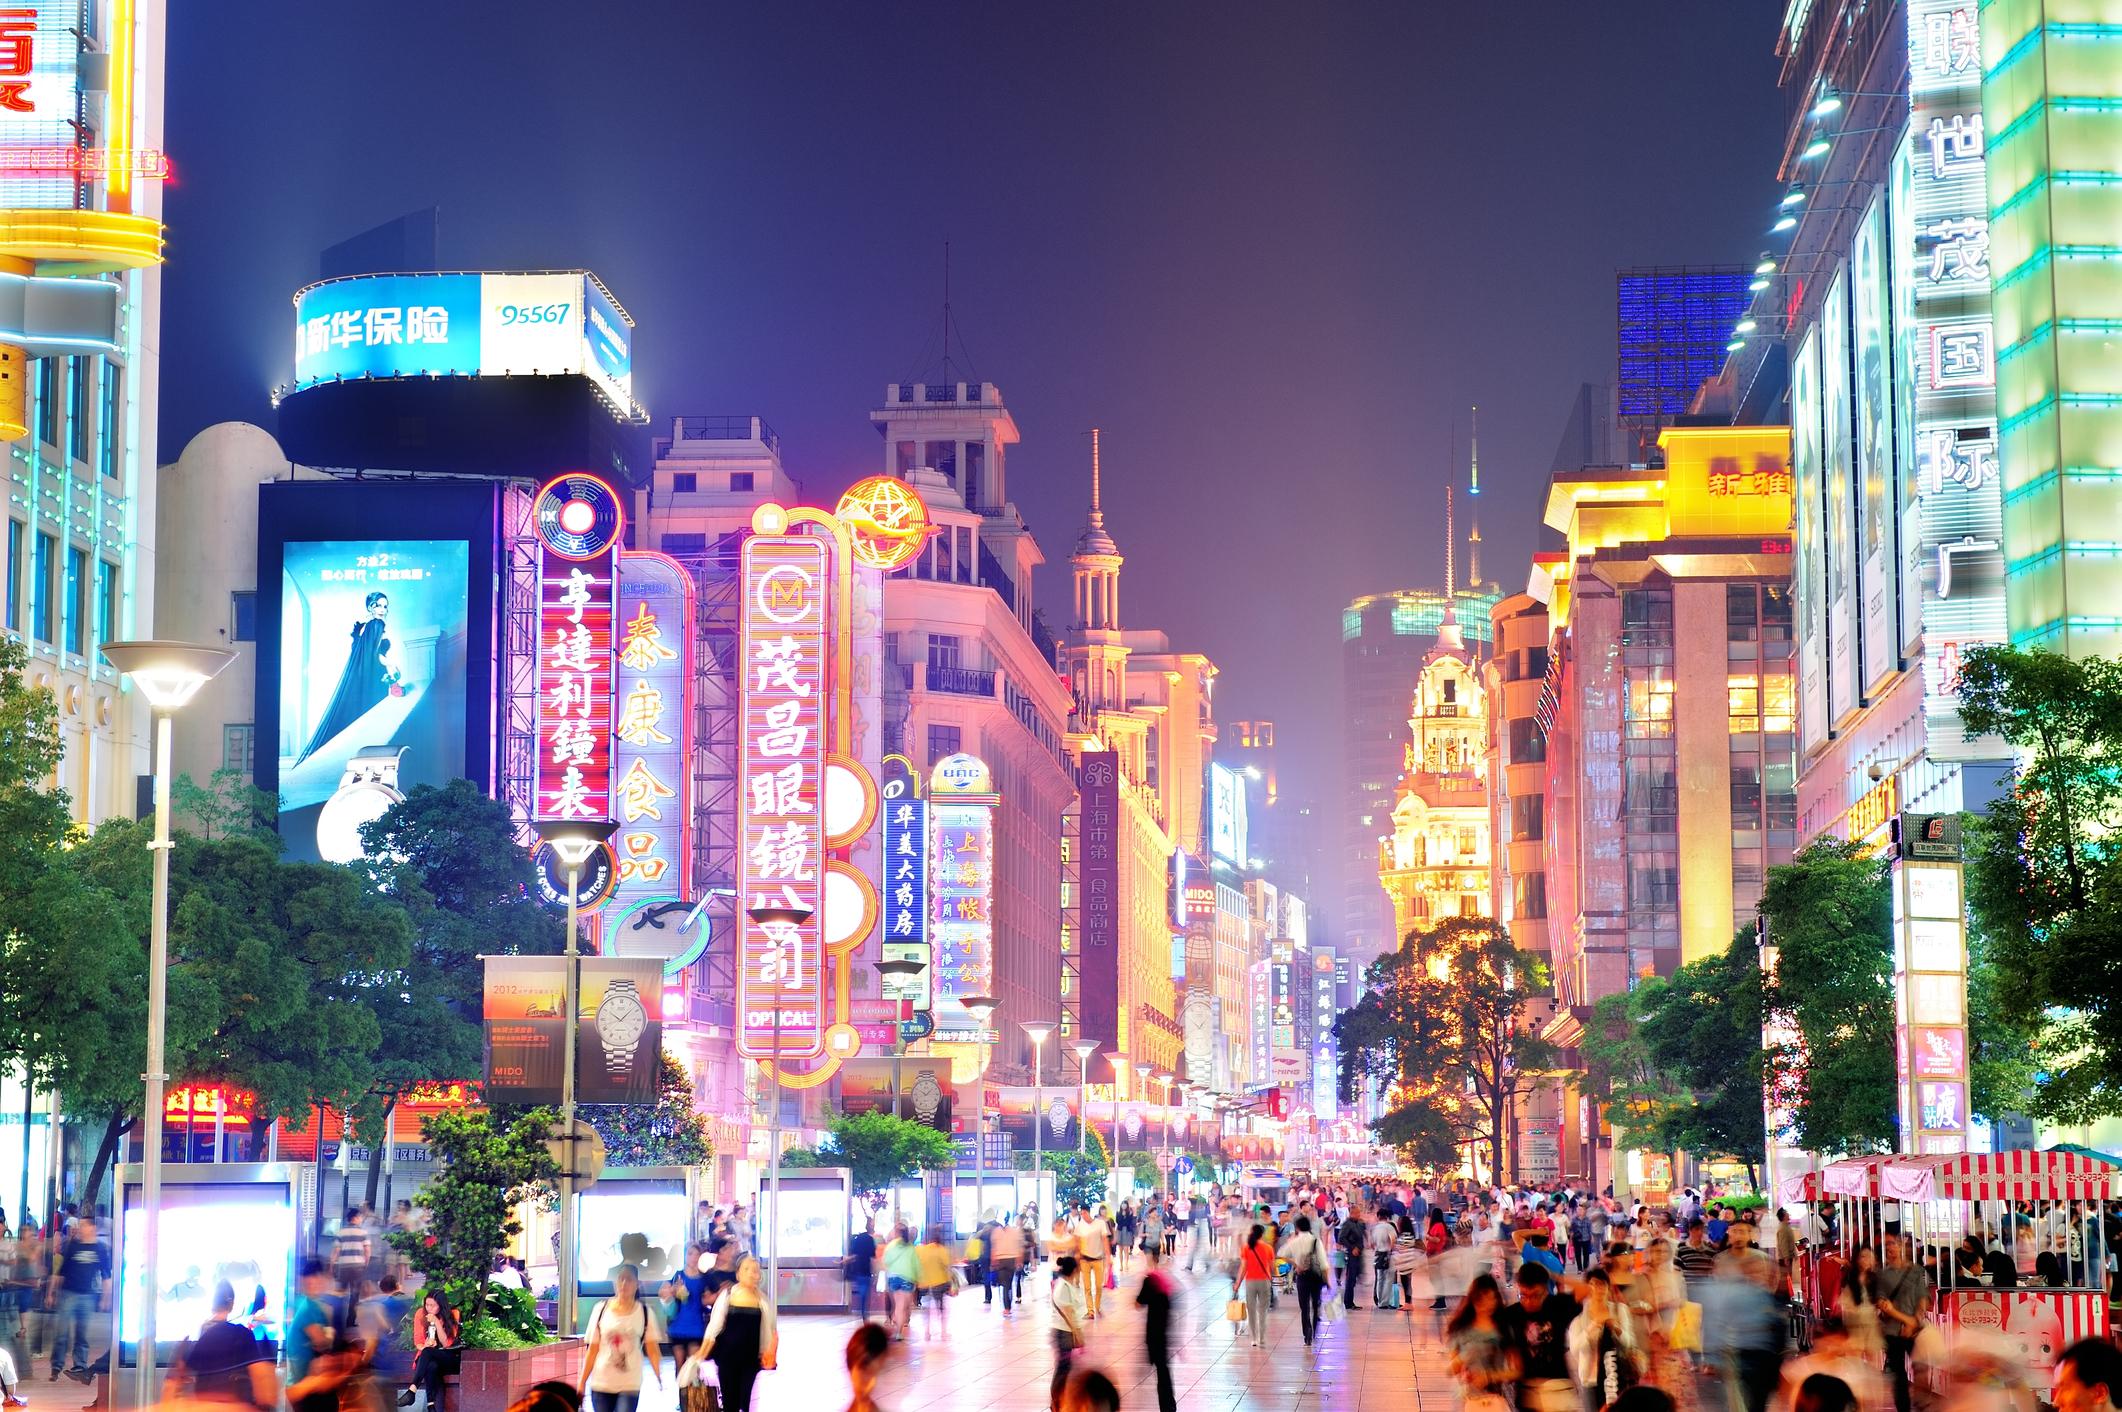 shanghai licensed songquan deng